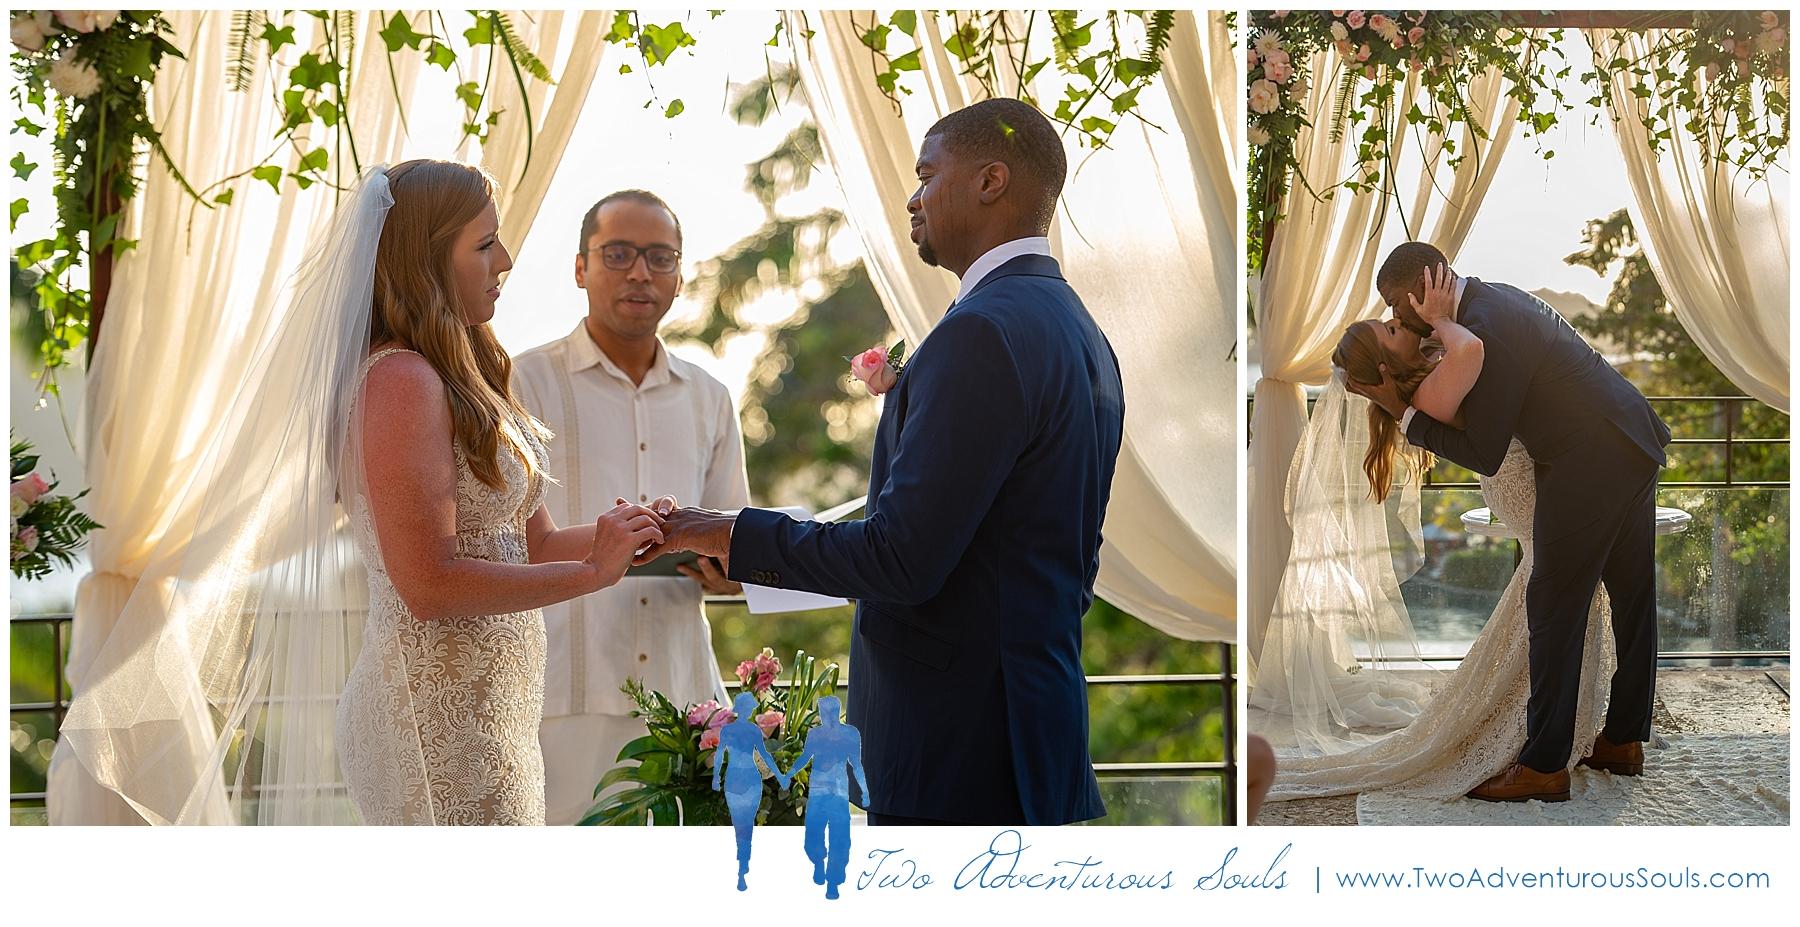 Costa Rica Wedding Photographers, Dreams las Mareas Wedding, Destination Wedding Photographers, Two Adventurous Souls - 022219_0026.jpg